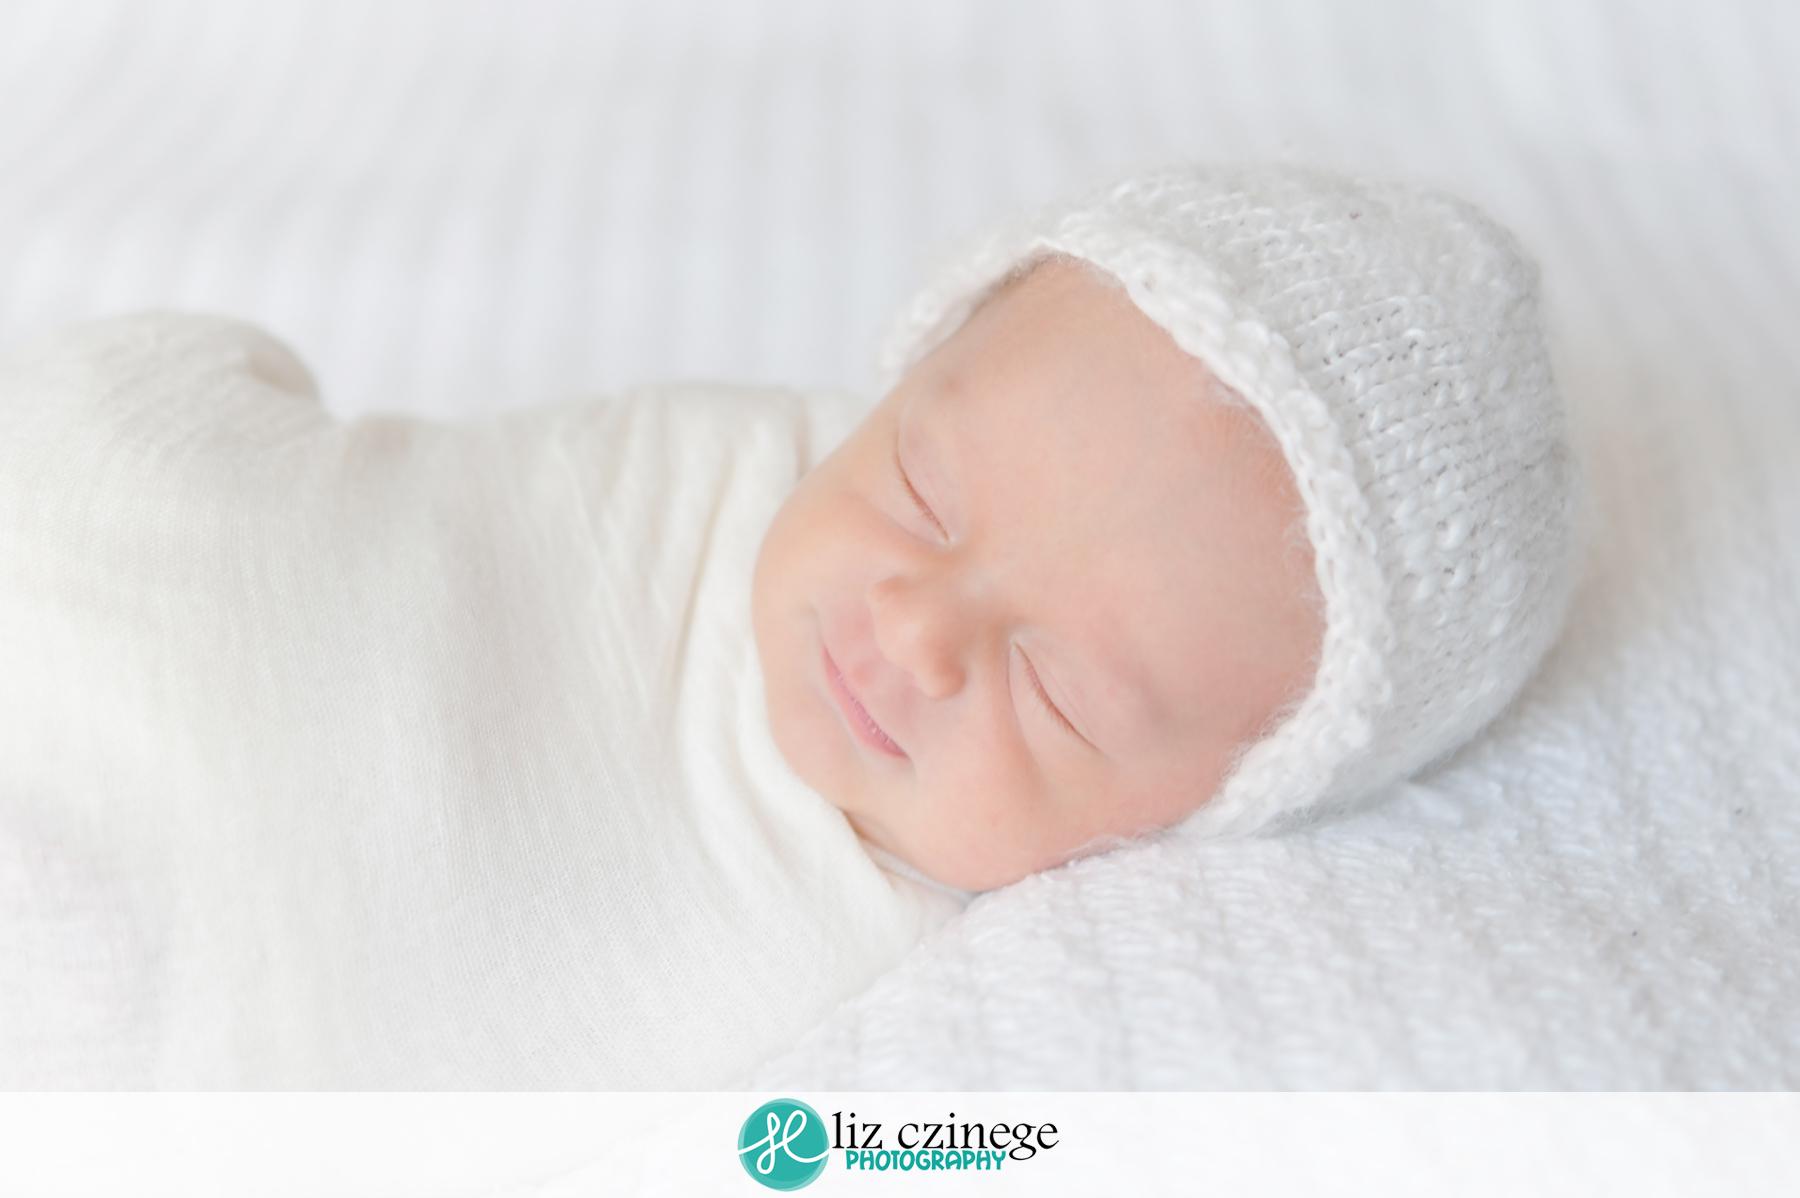 czinege-photography-niagara-newborn-03